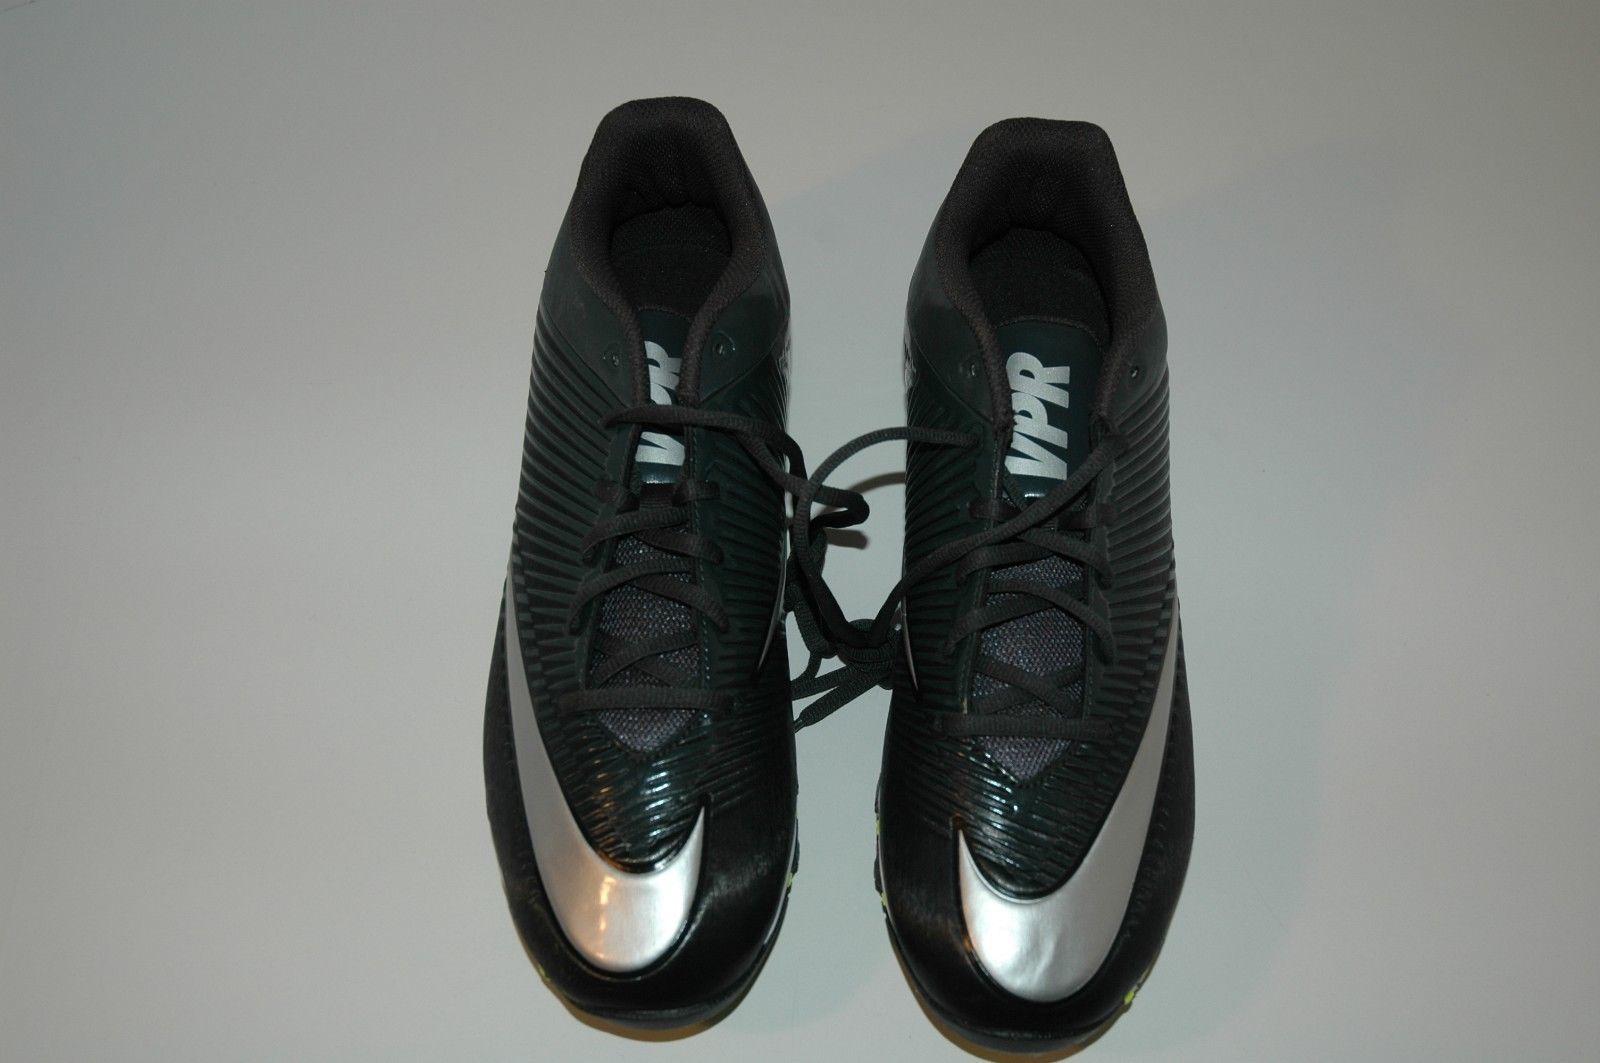 86c78ee0a28e Nike Vapor Shark 2 833391 002 Men's Football and 50 similar items. S l1600